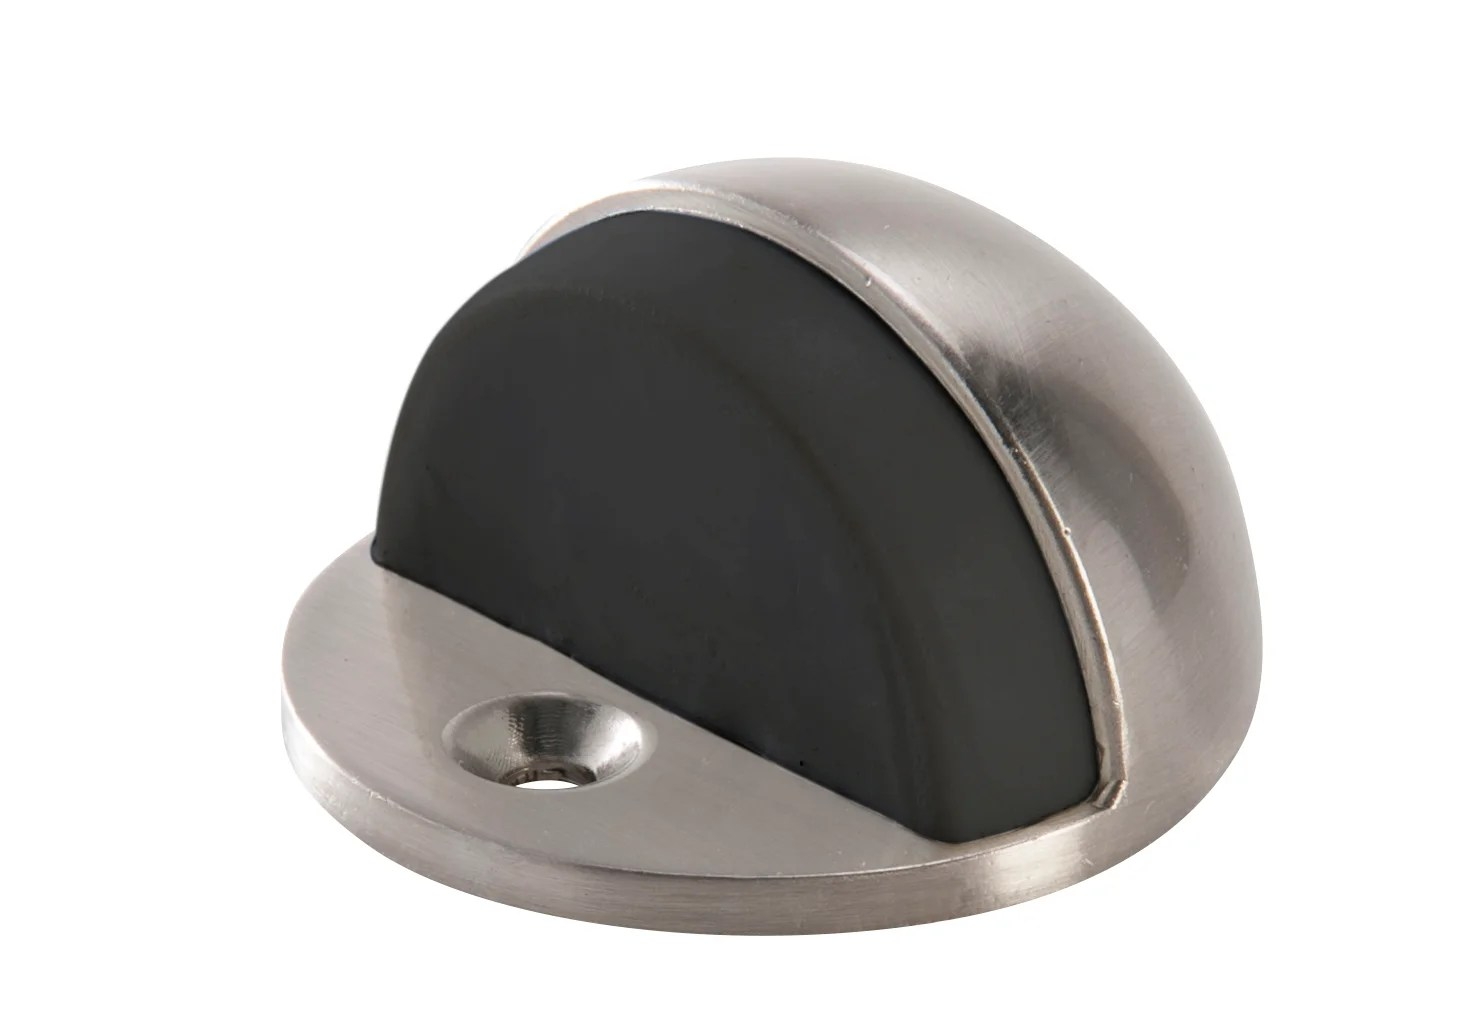 Butee De Porte Standers Acier Inoxydable Gris D 4 5 Cm X L 4 5 Cm X H 2 3 Cm Leroy Merlin